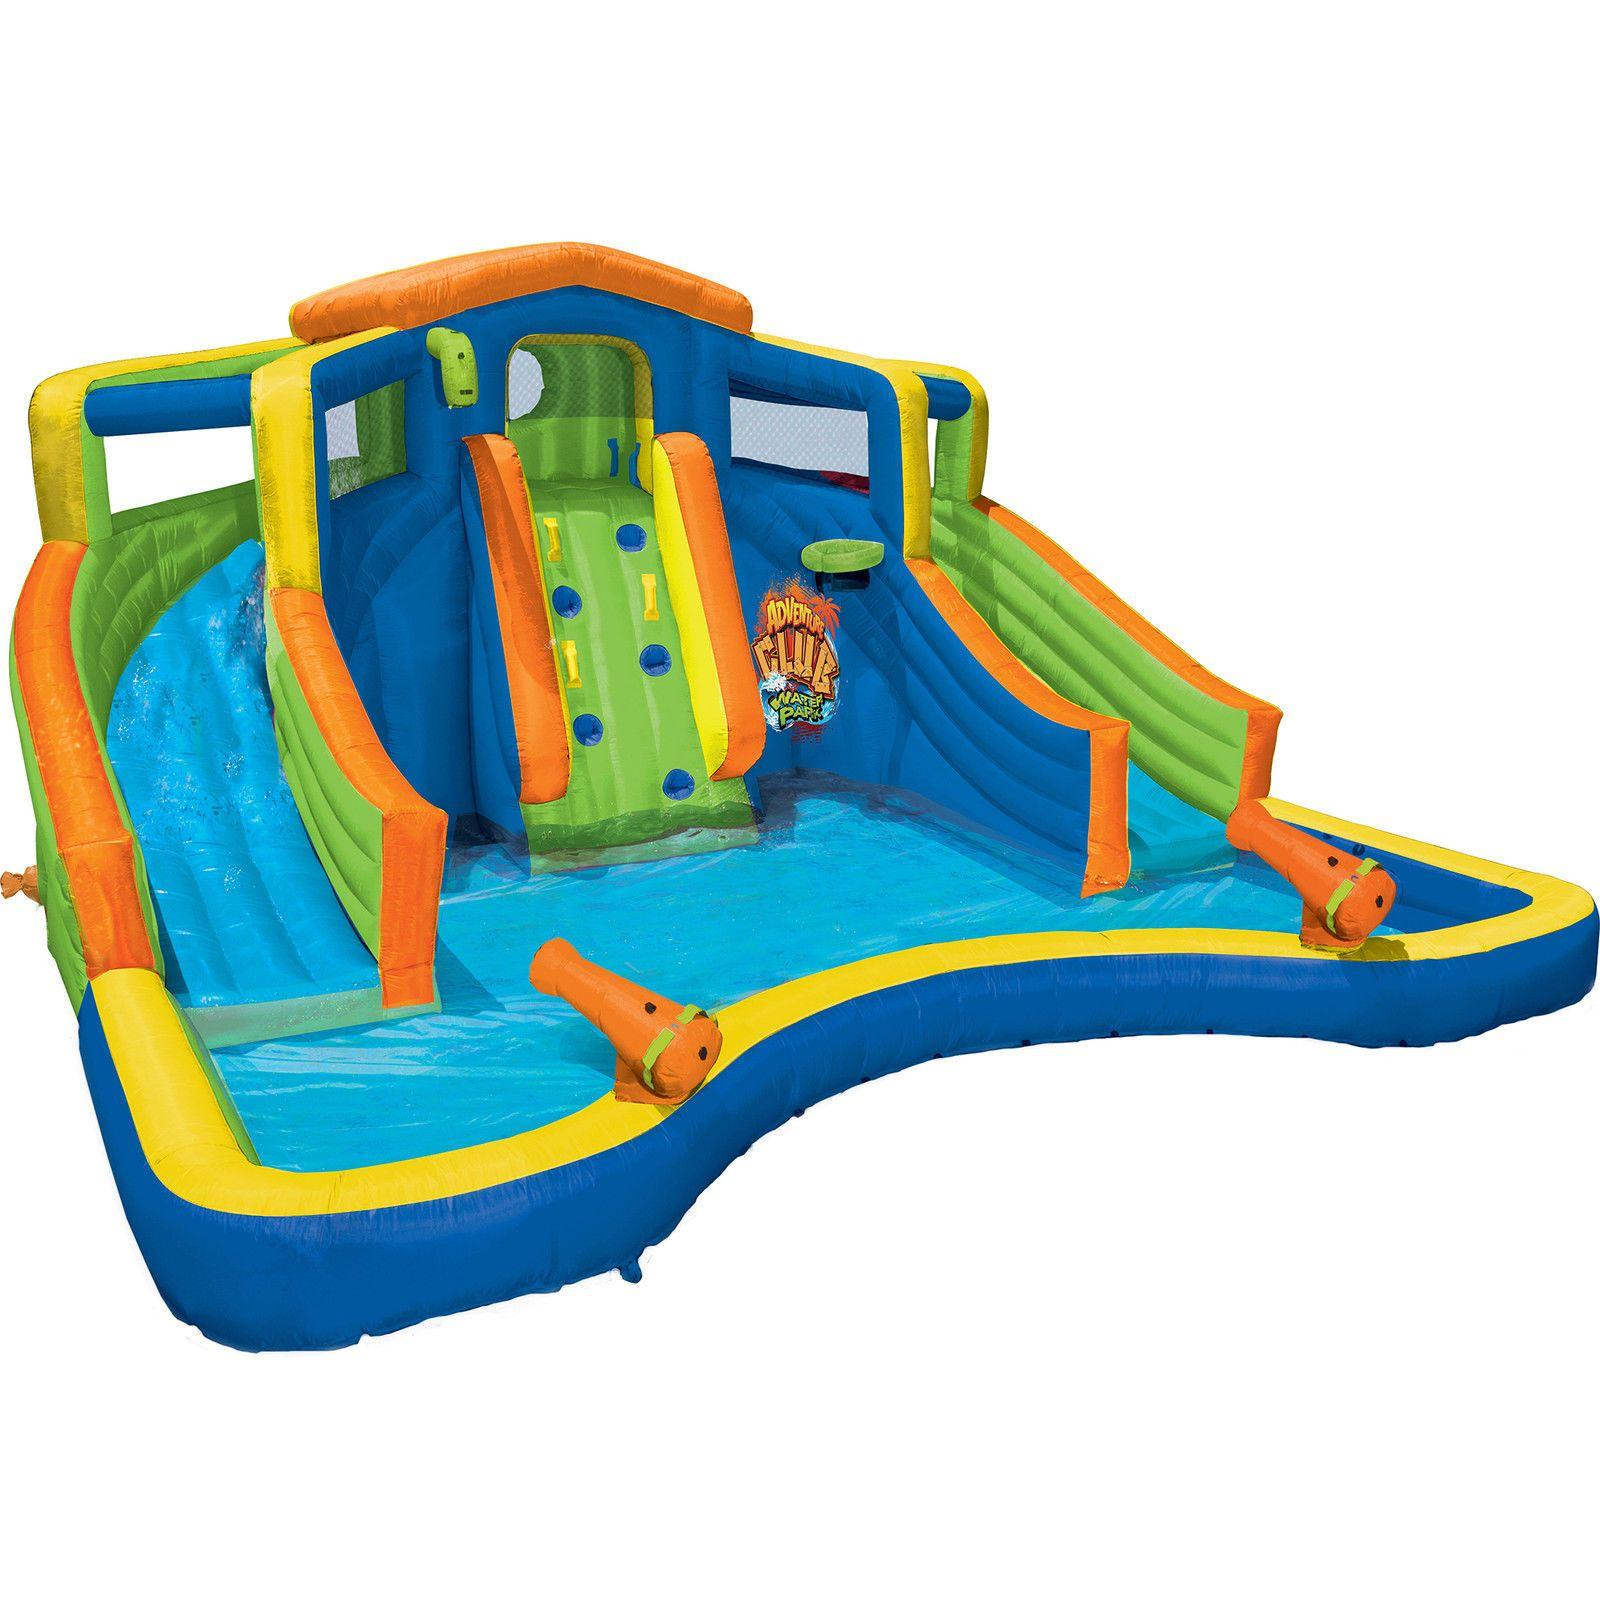 Banzai Inflatable Adventure Club Dual Slide And Pool Backyard Water Park Cartel Feliz Cumpleanos Iconos De Instagram Instagram